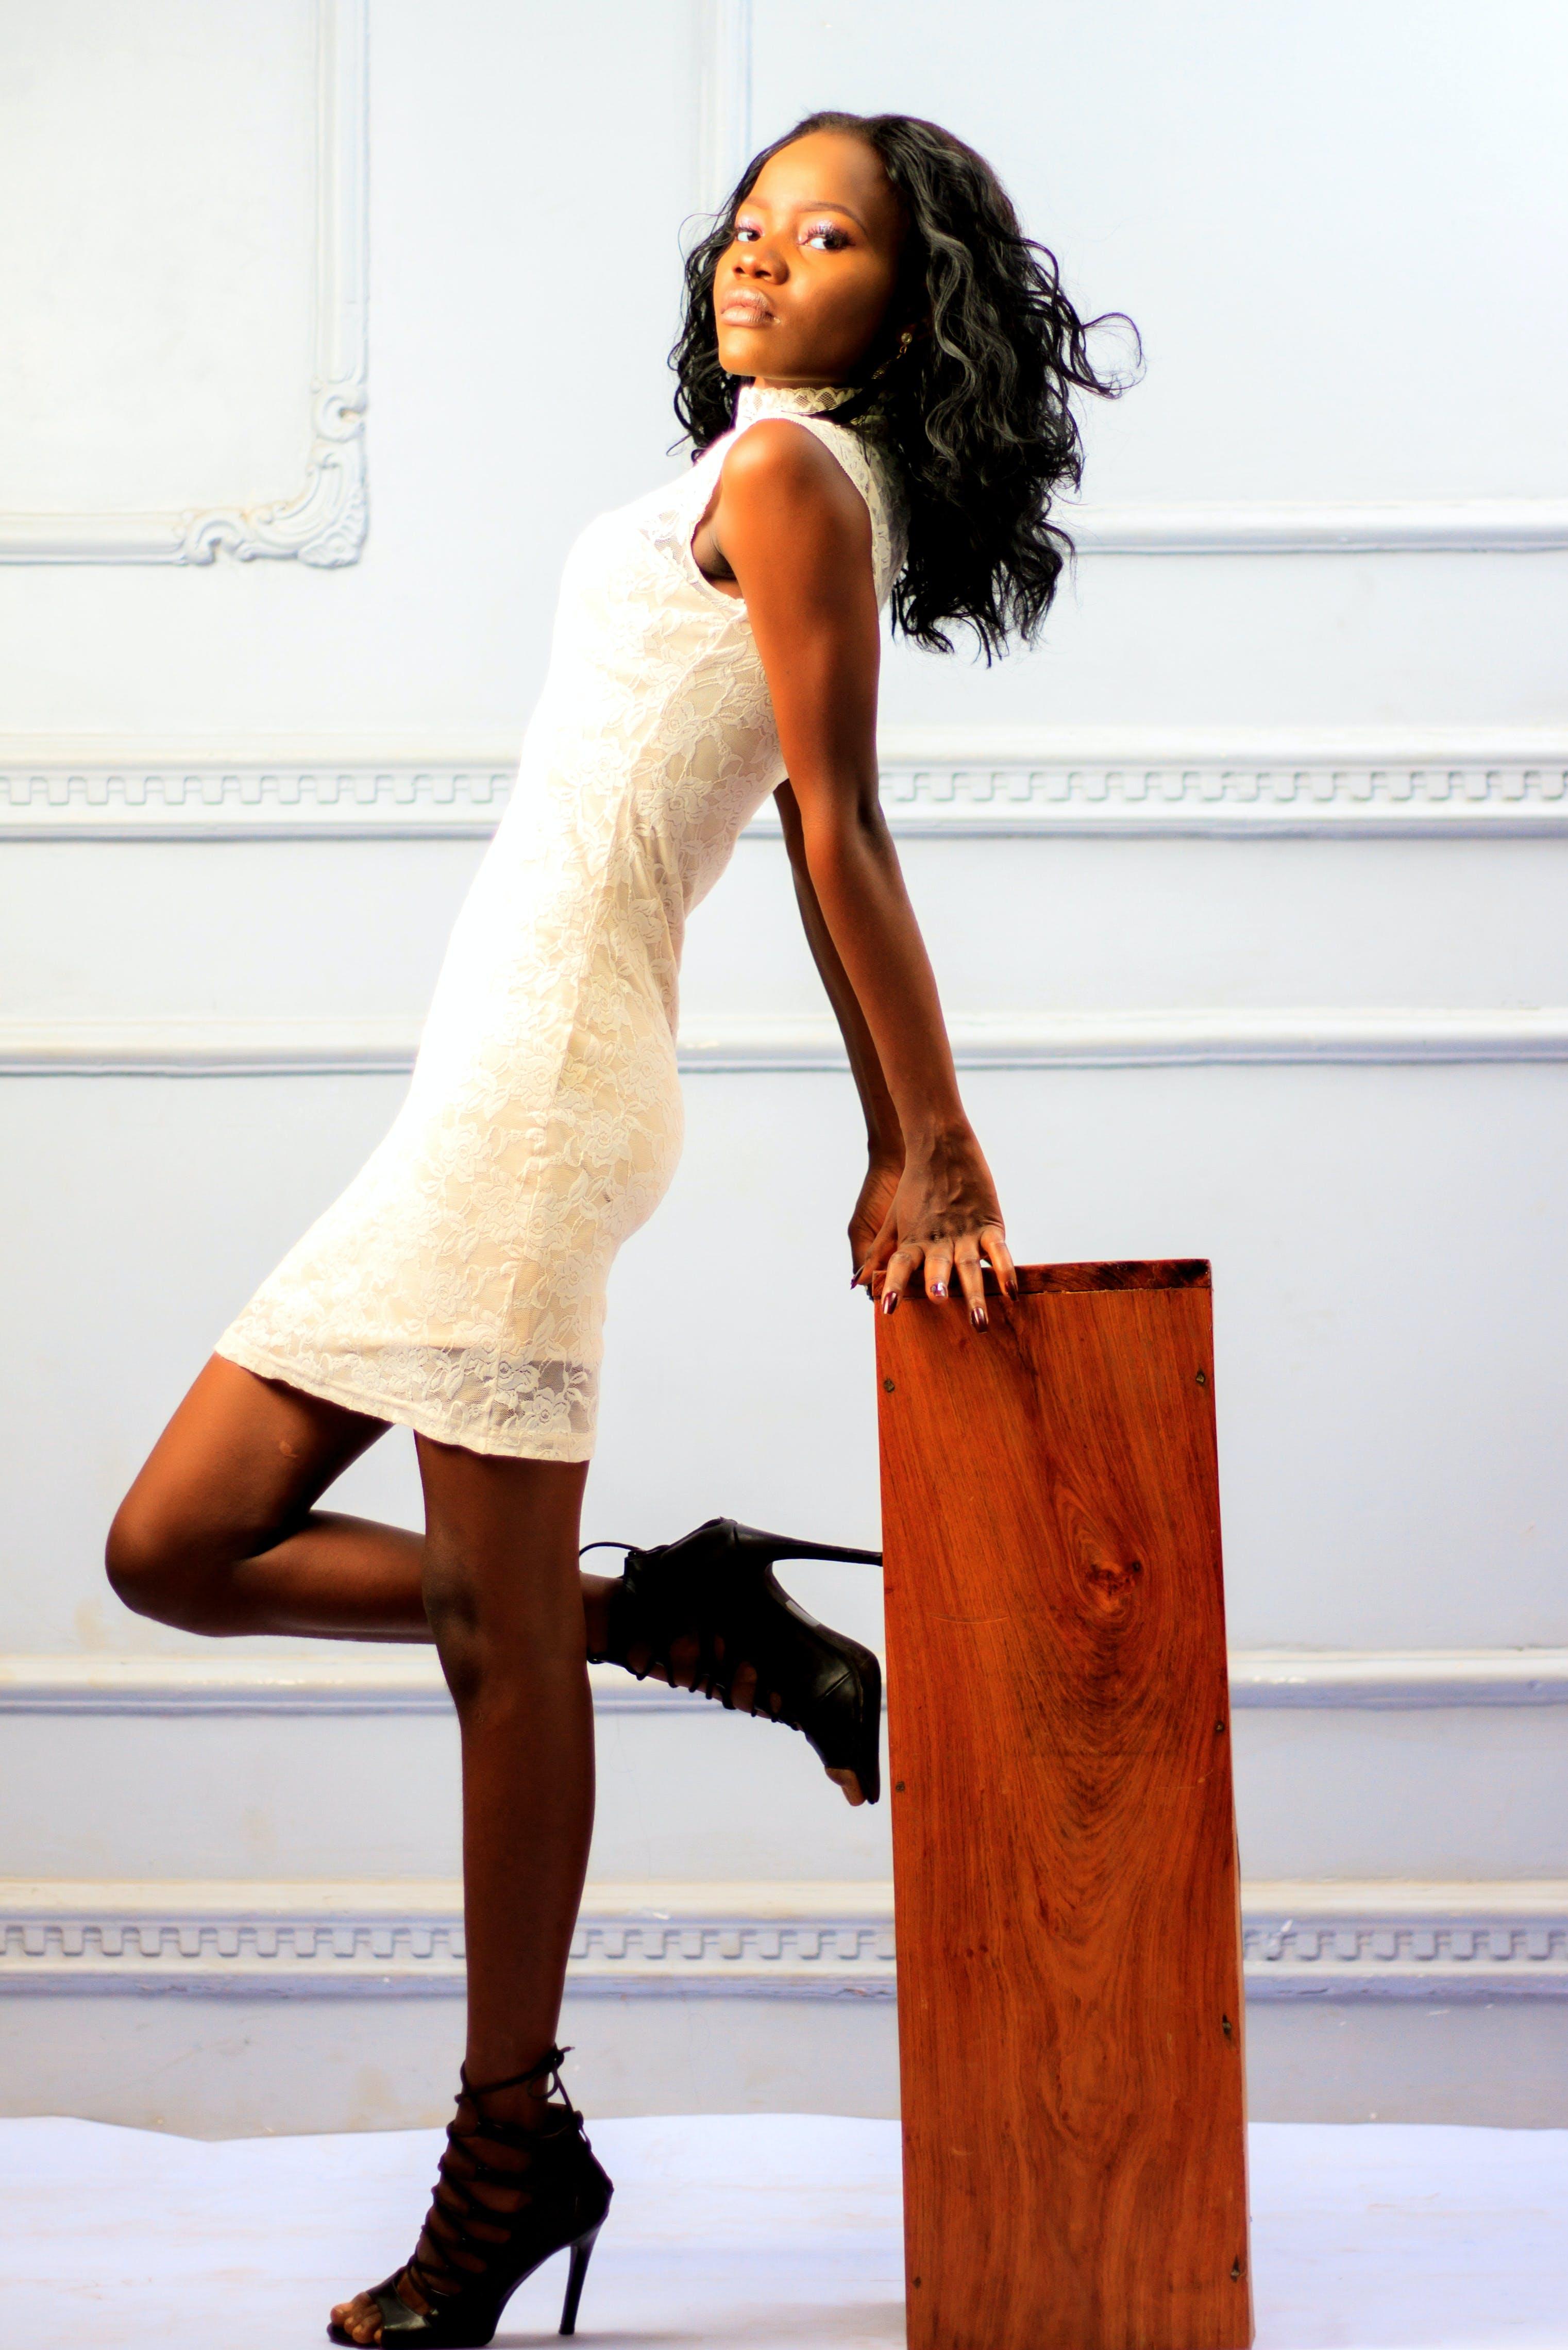 Kostenloses Stock Foto zu afroamerikaner-frau, dame, drinnen, farbige frau